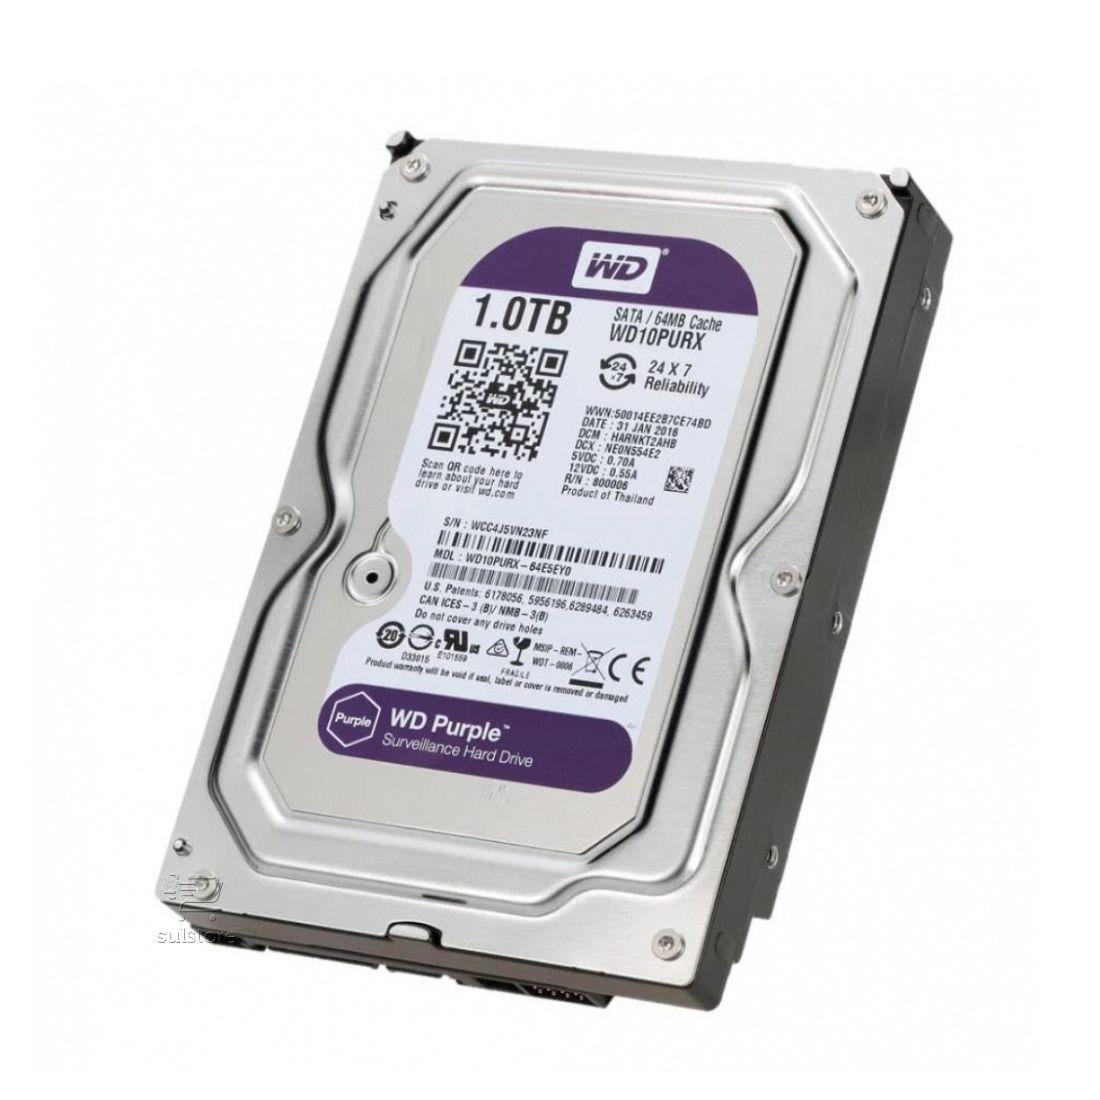 HD 1TB Purple WD10PURZ Western Digital Sata Intelbras WD CFTV DVR Para Câmeras